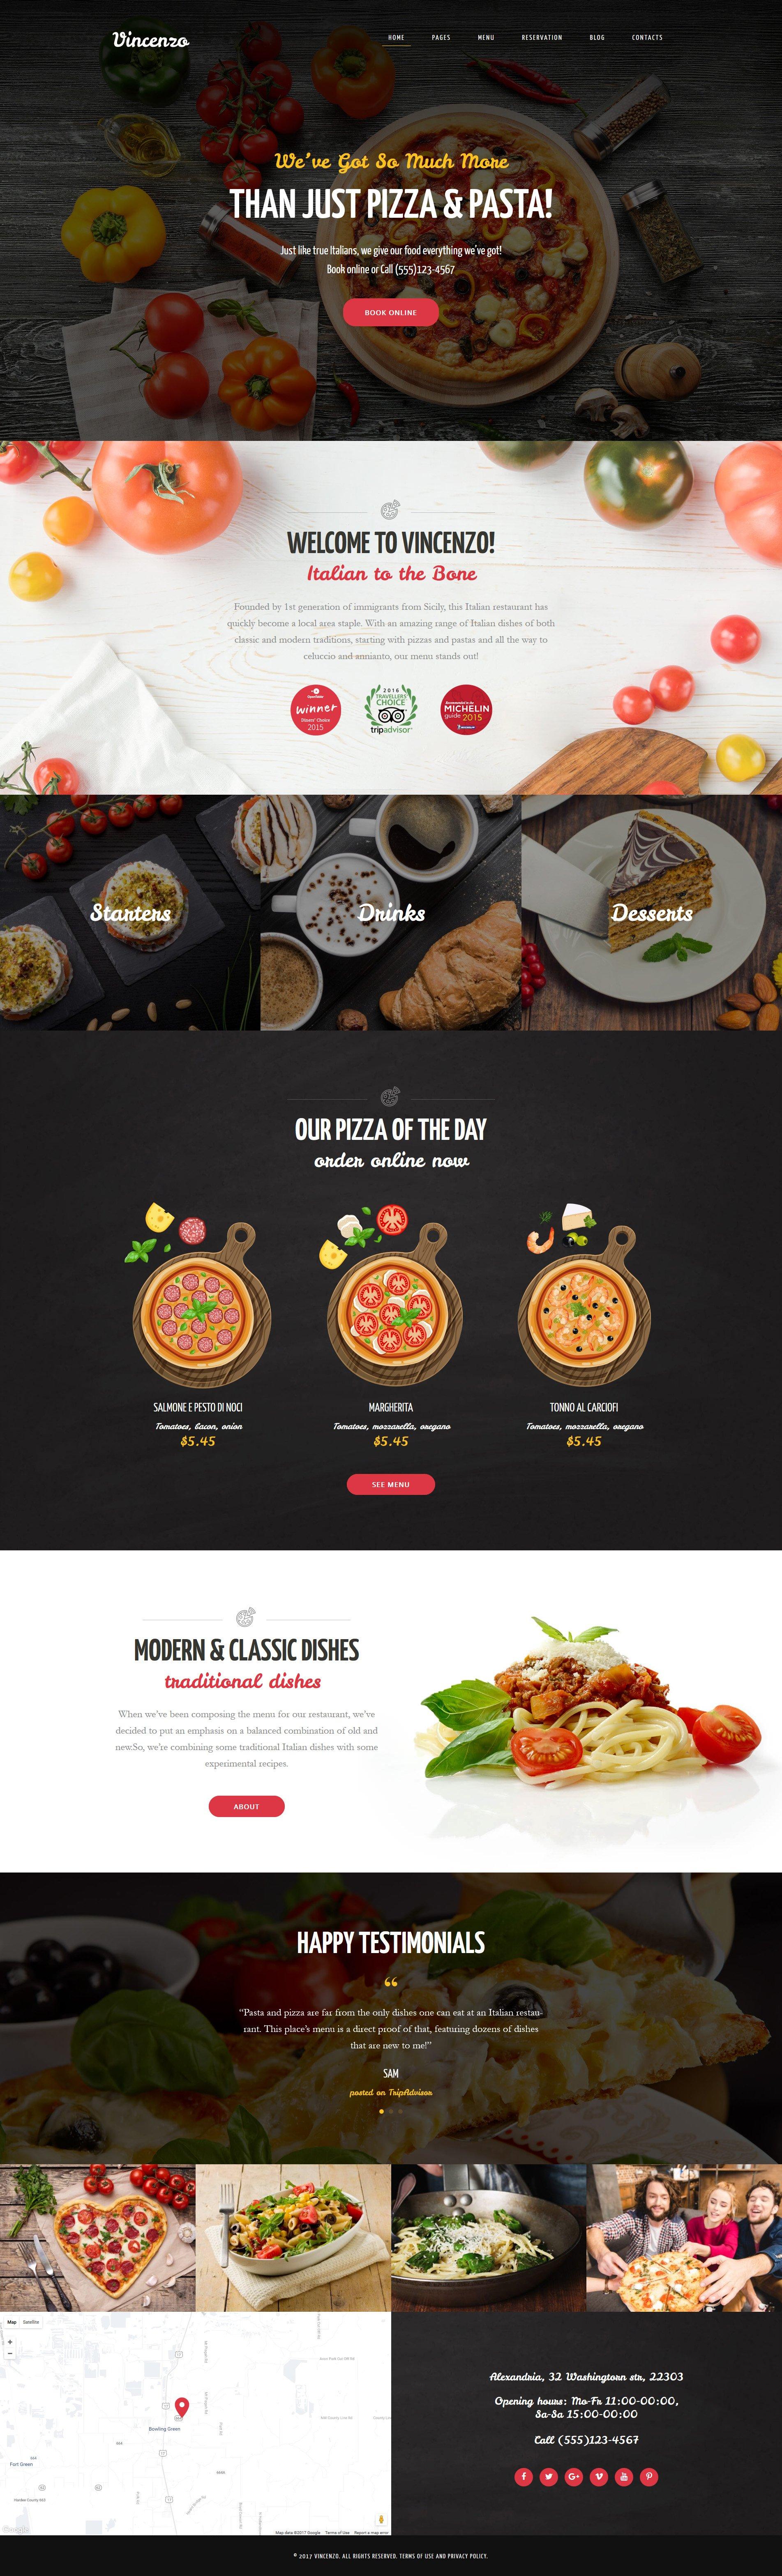 """Vincenzo - Delicious Pizza Restaurant Responsive"" thème WordPress adaptatif #63633"